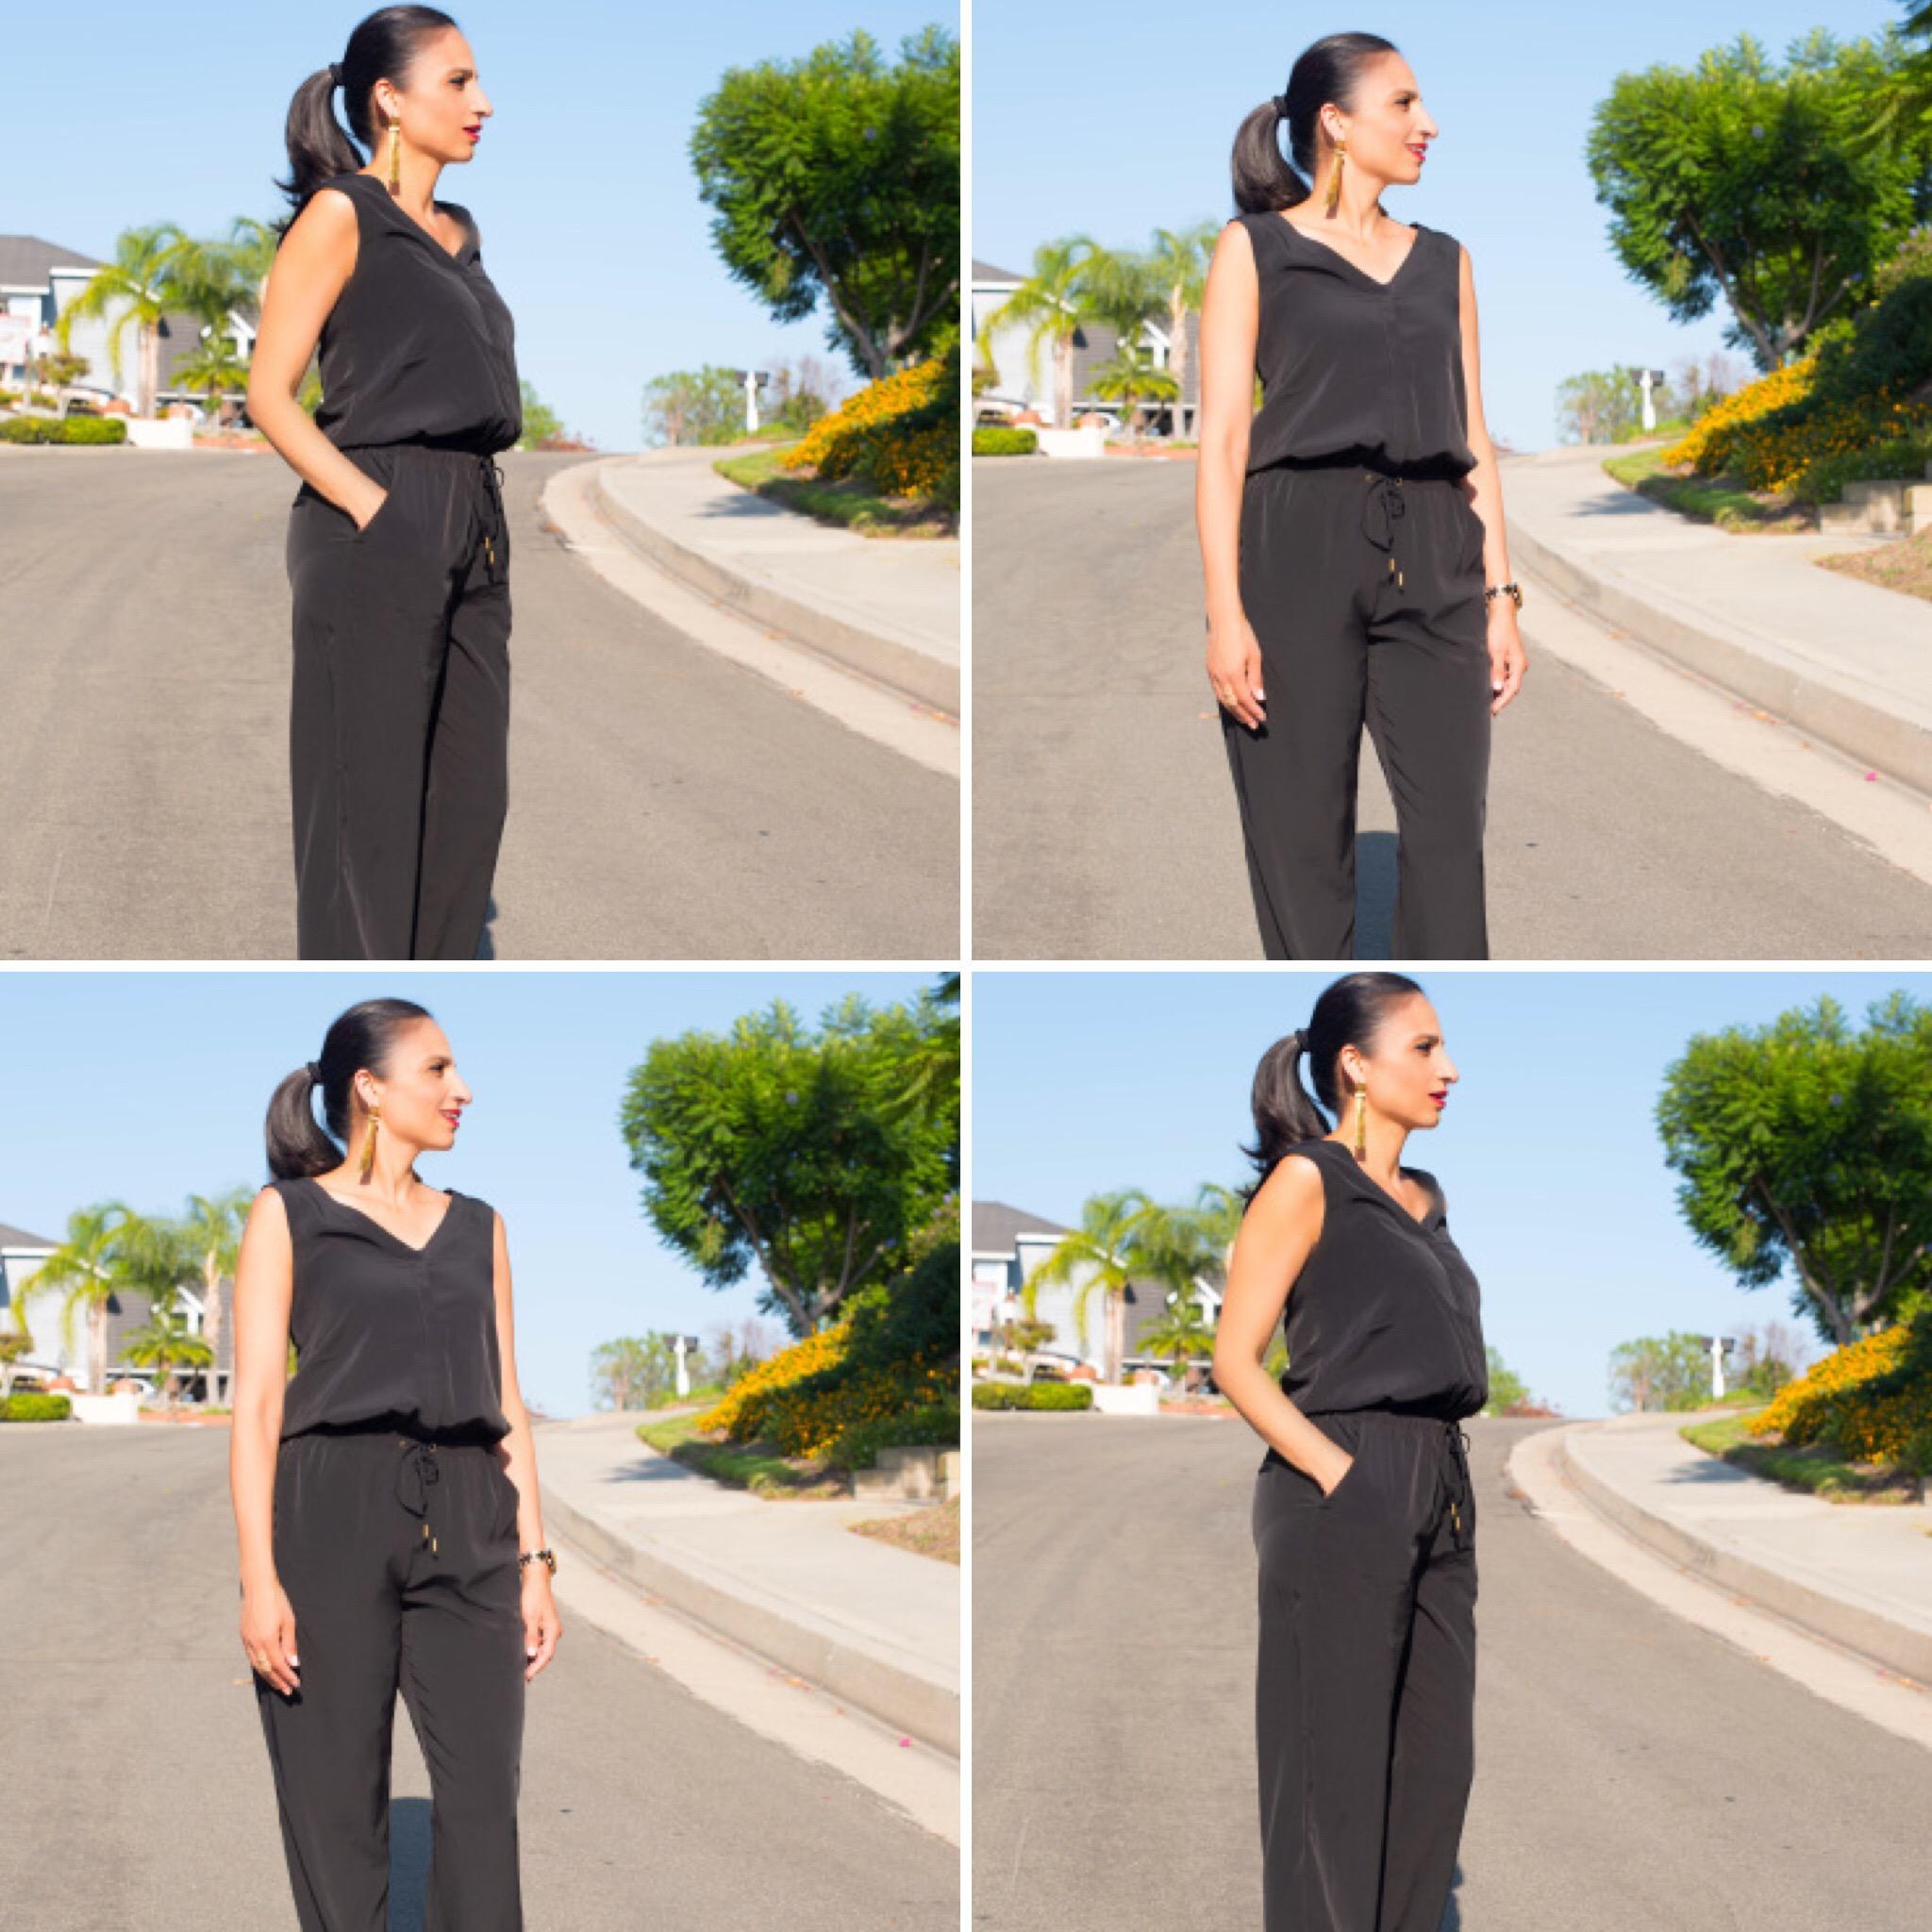 5 Takeaways On Rocking Your Pretty Black Jumpsuit Brown Girl Magazine